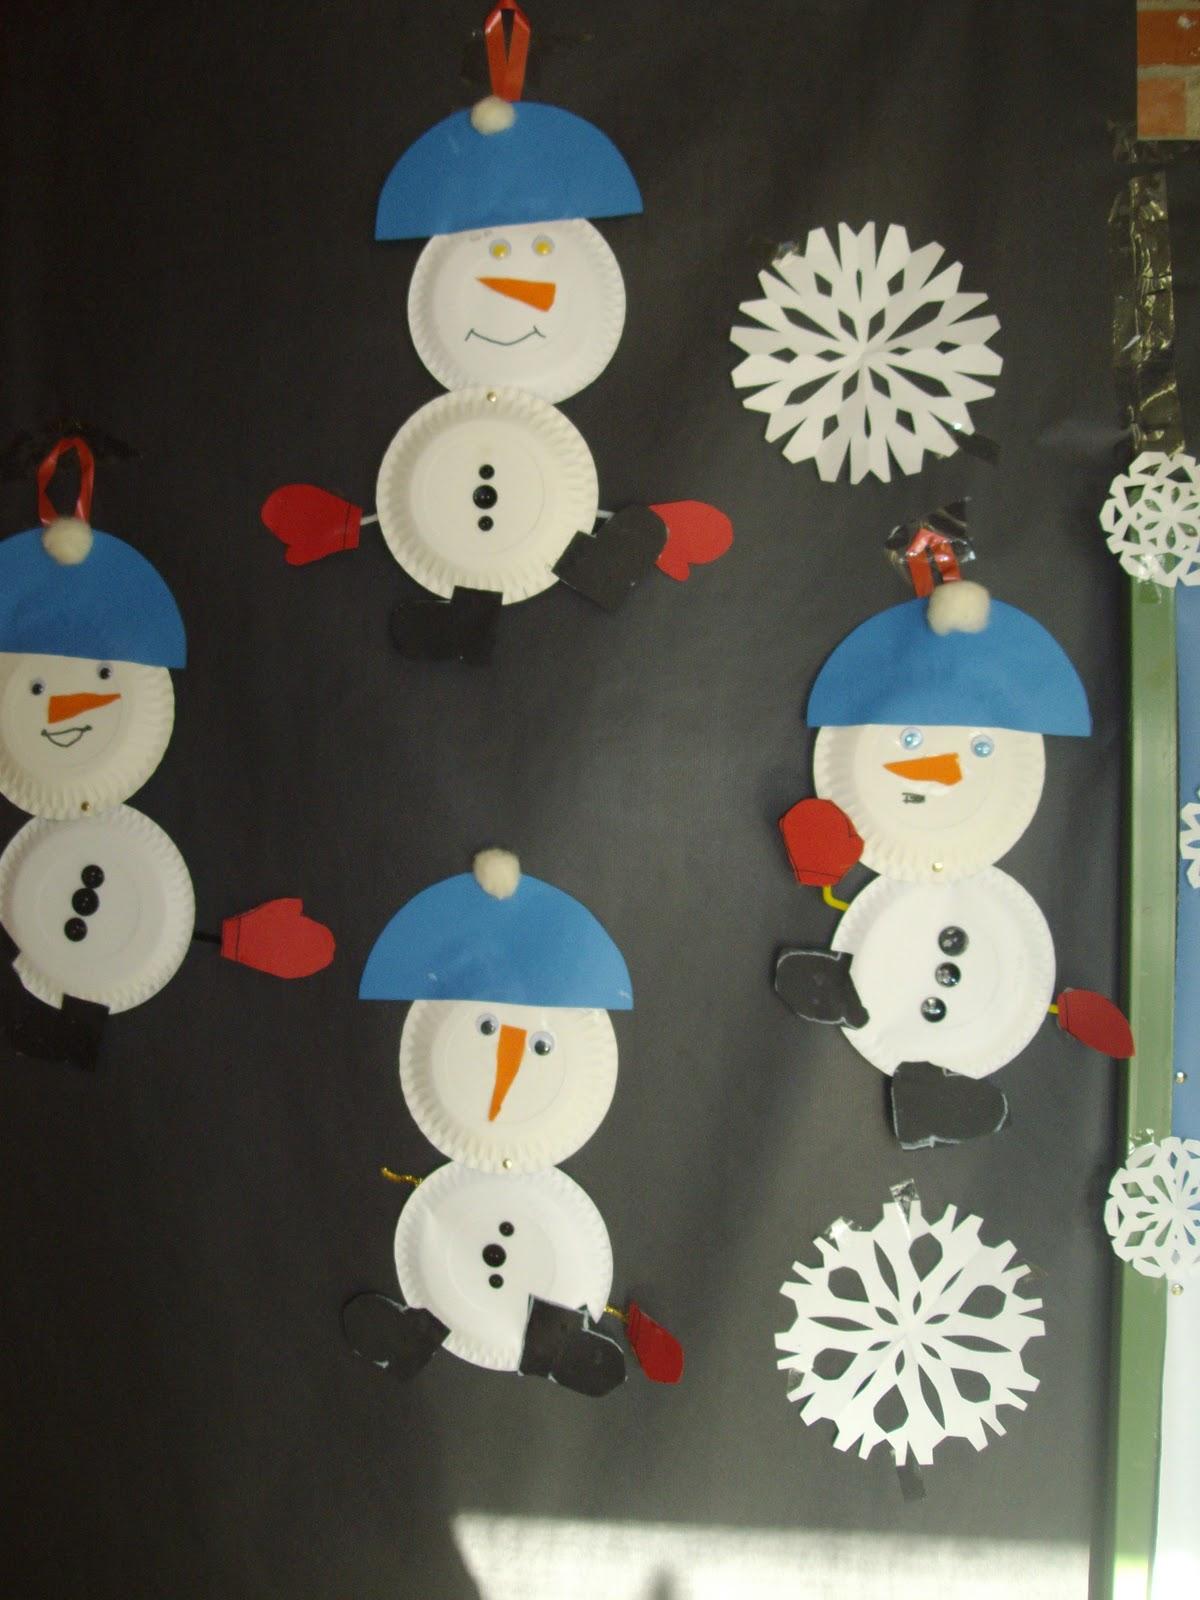 Decoracion invierno manualidades for Manualidades decoracion infantil